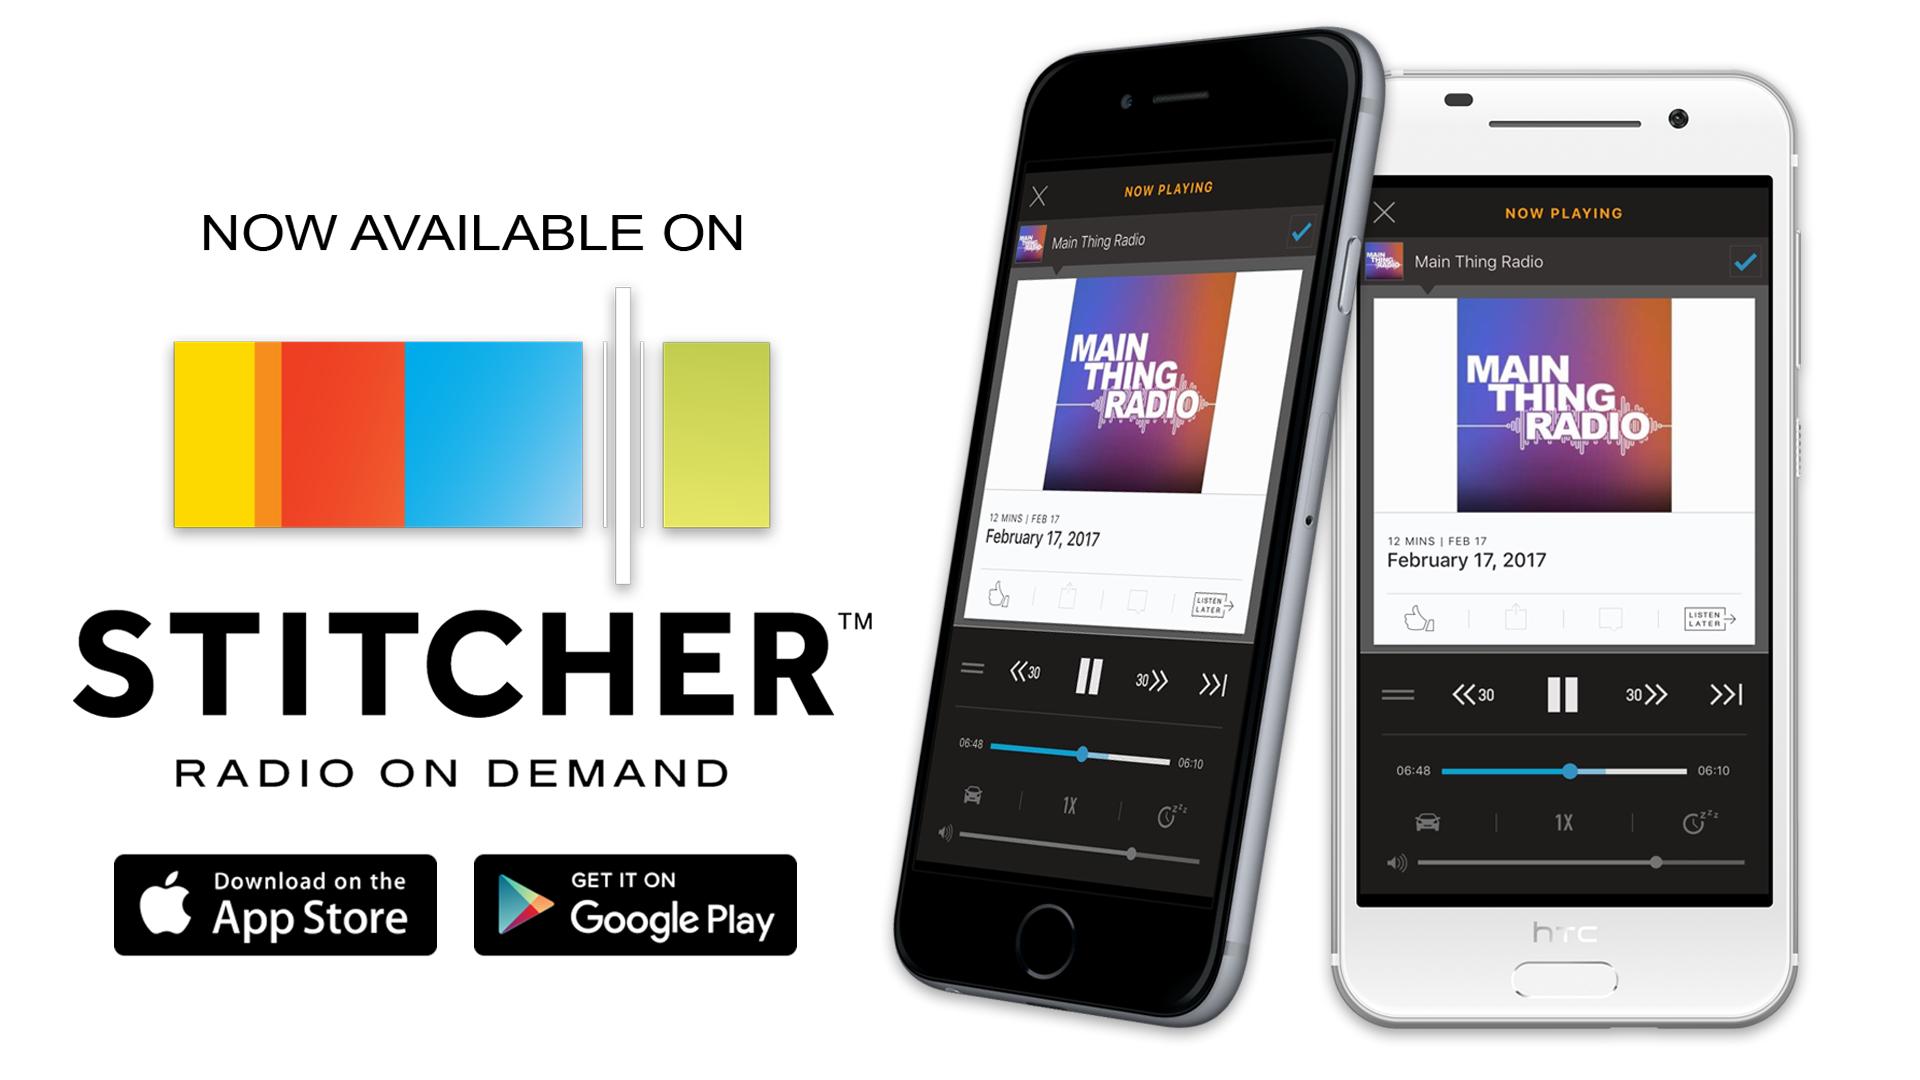 StitcherRadioAd.png